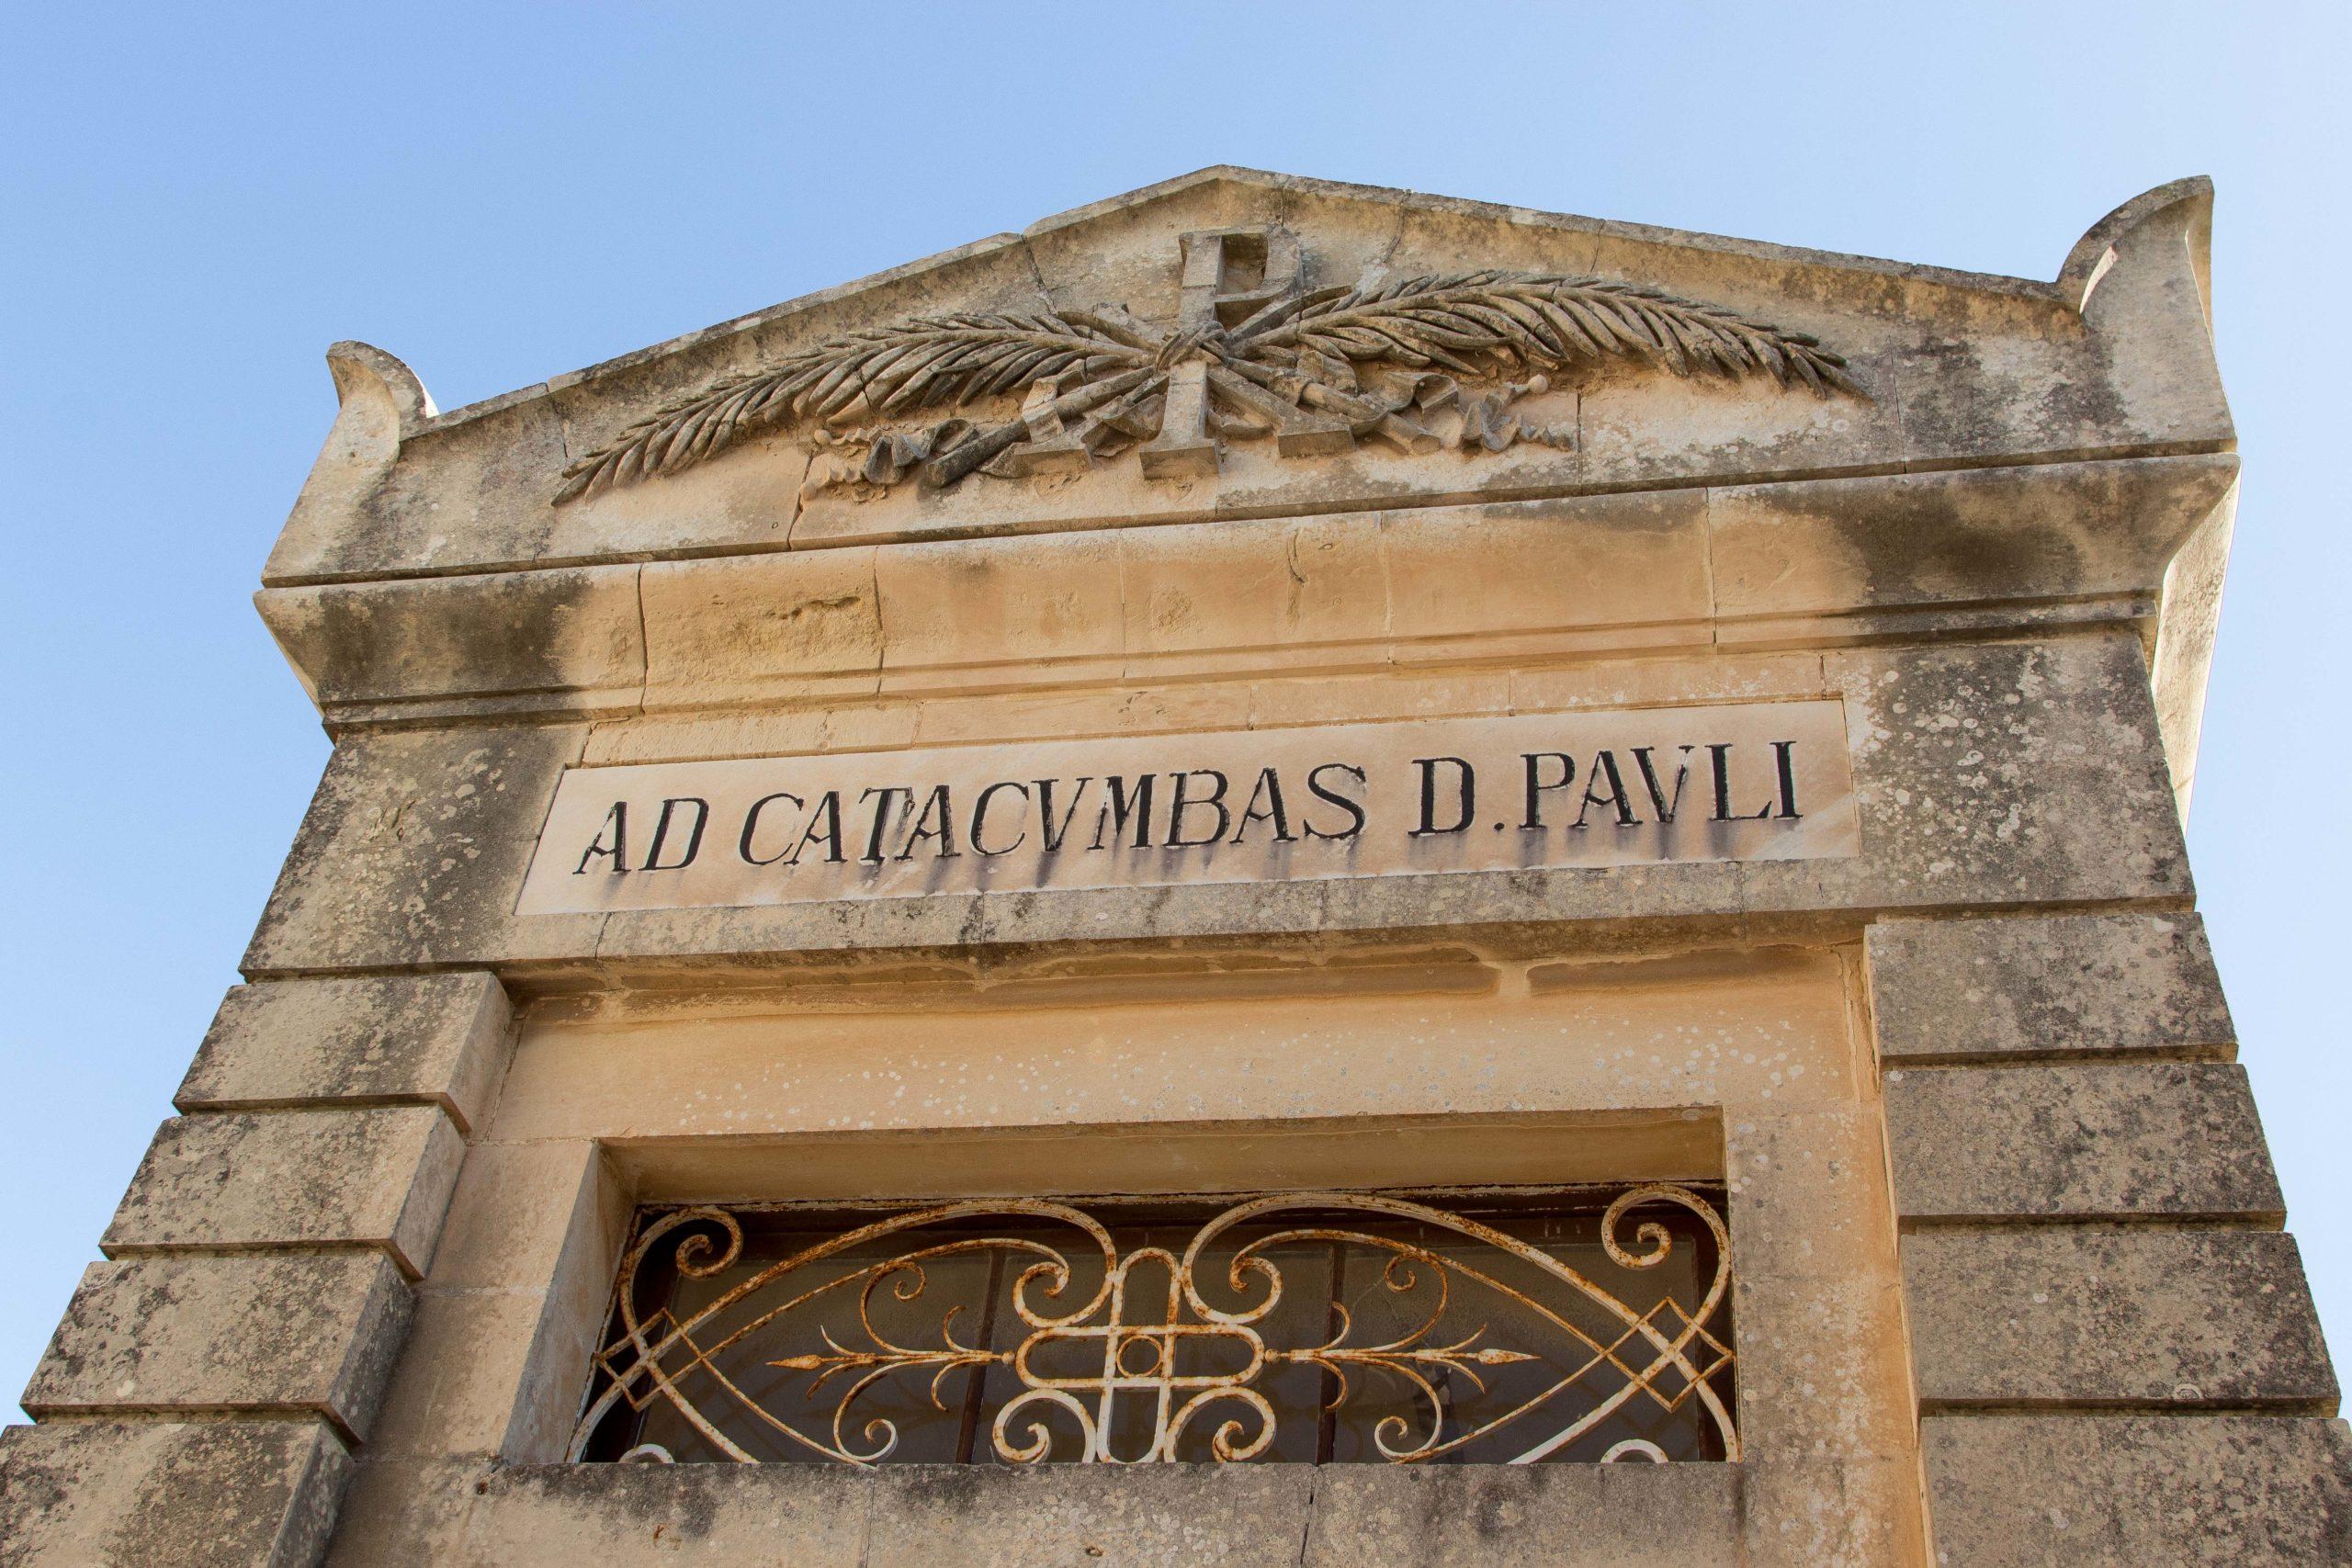 Katakumby Św. Pawła Rabat Malta